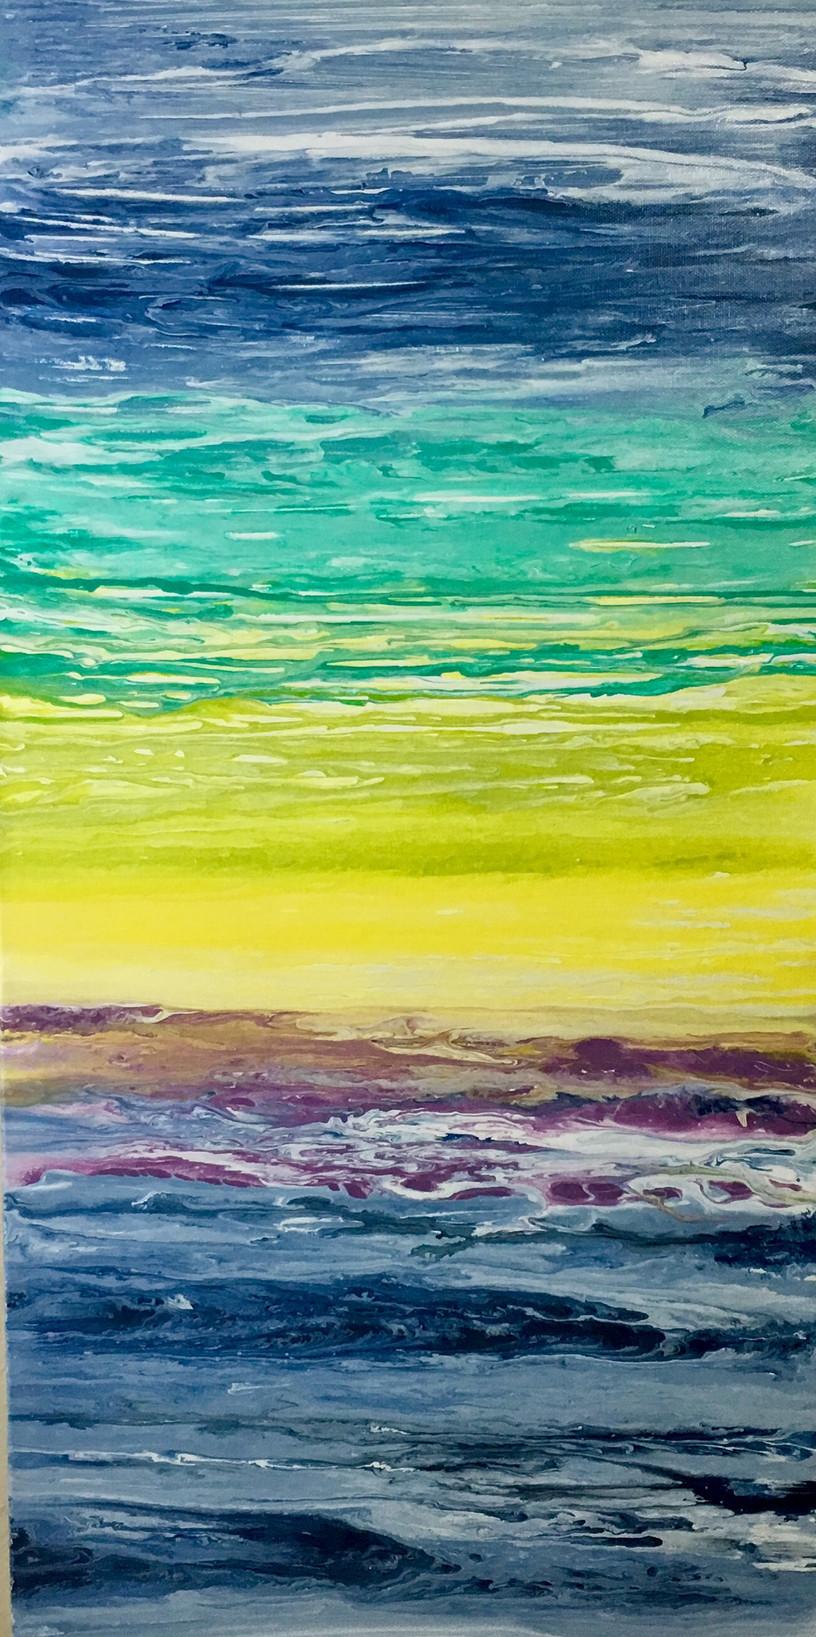 Sieze the Sea